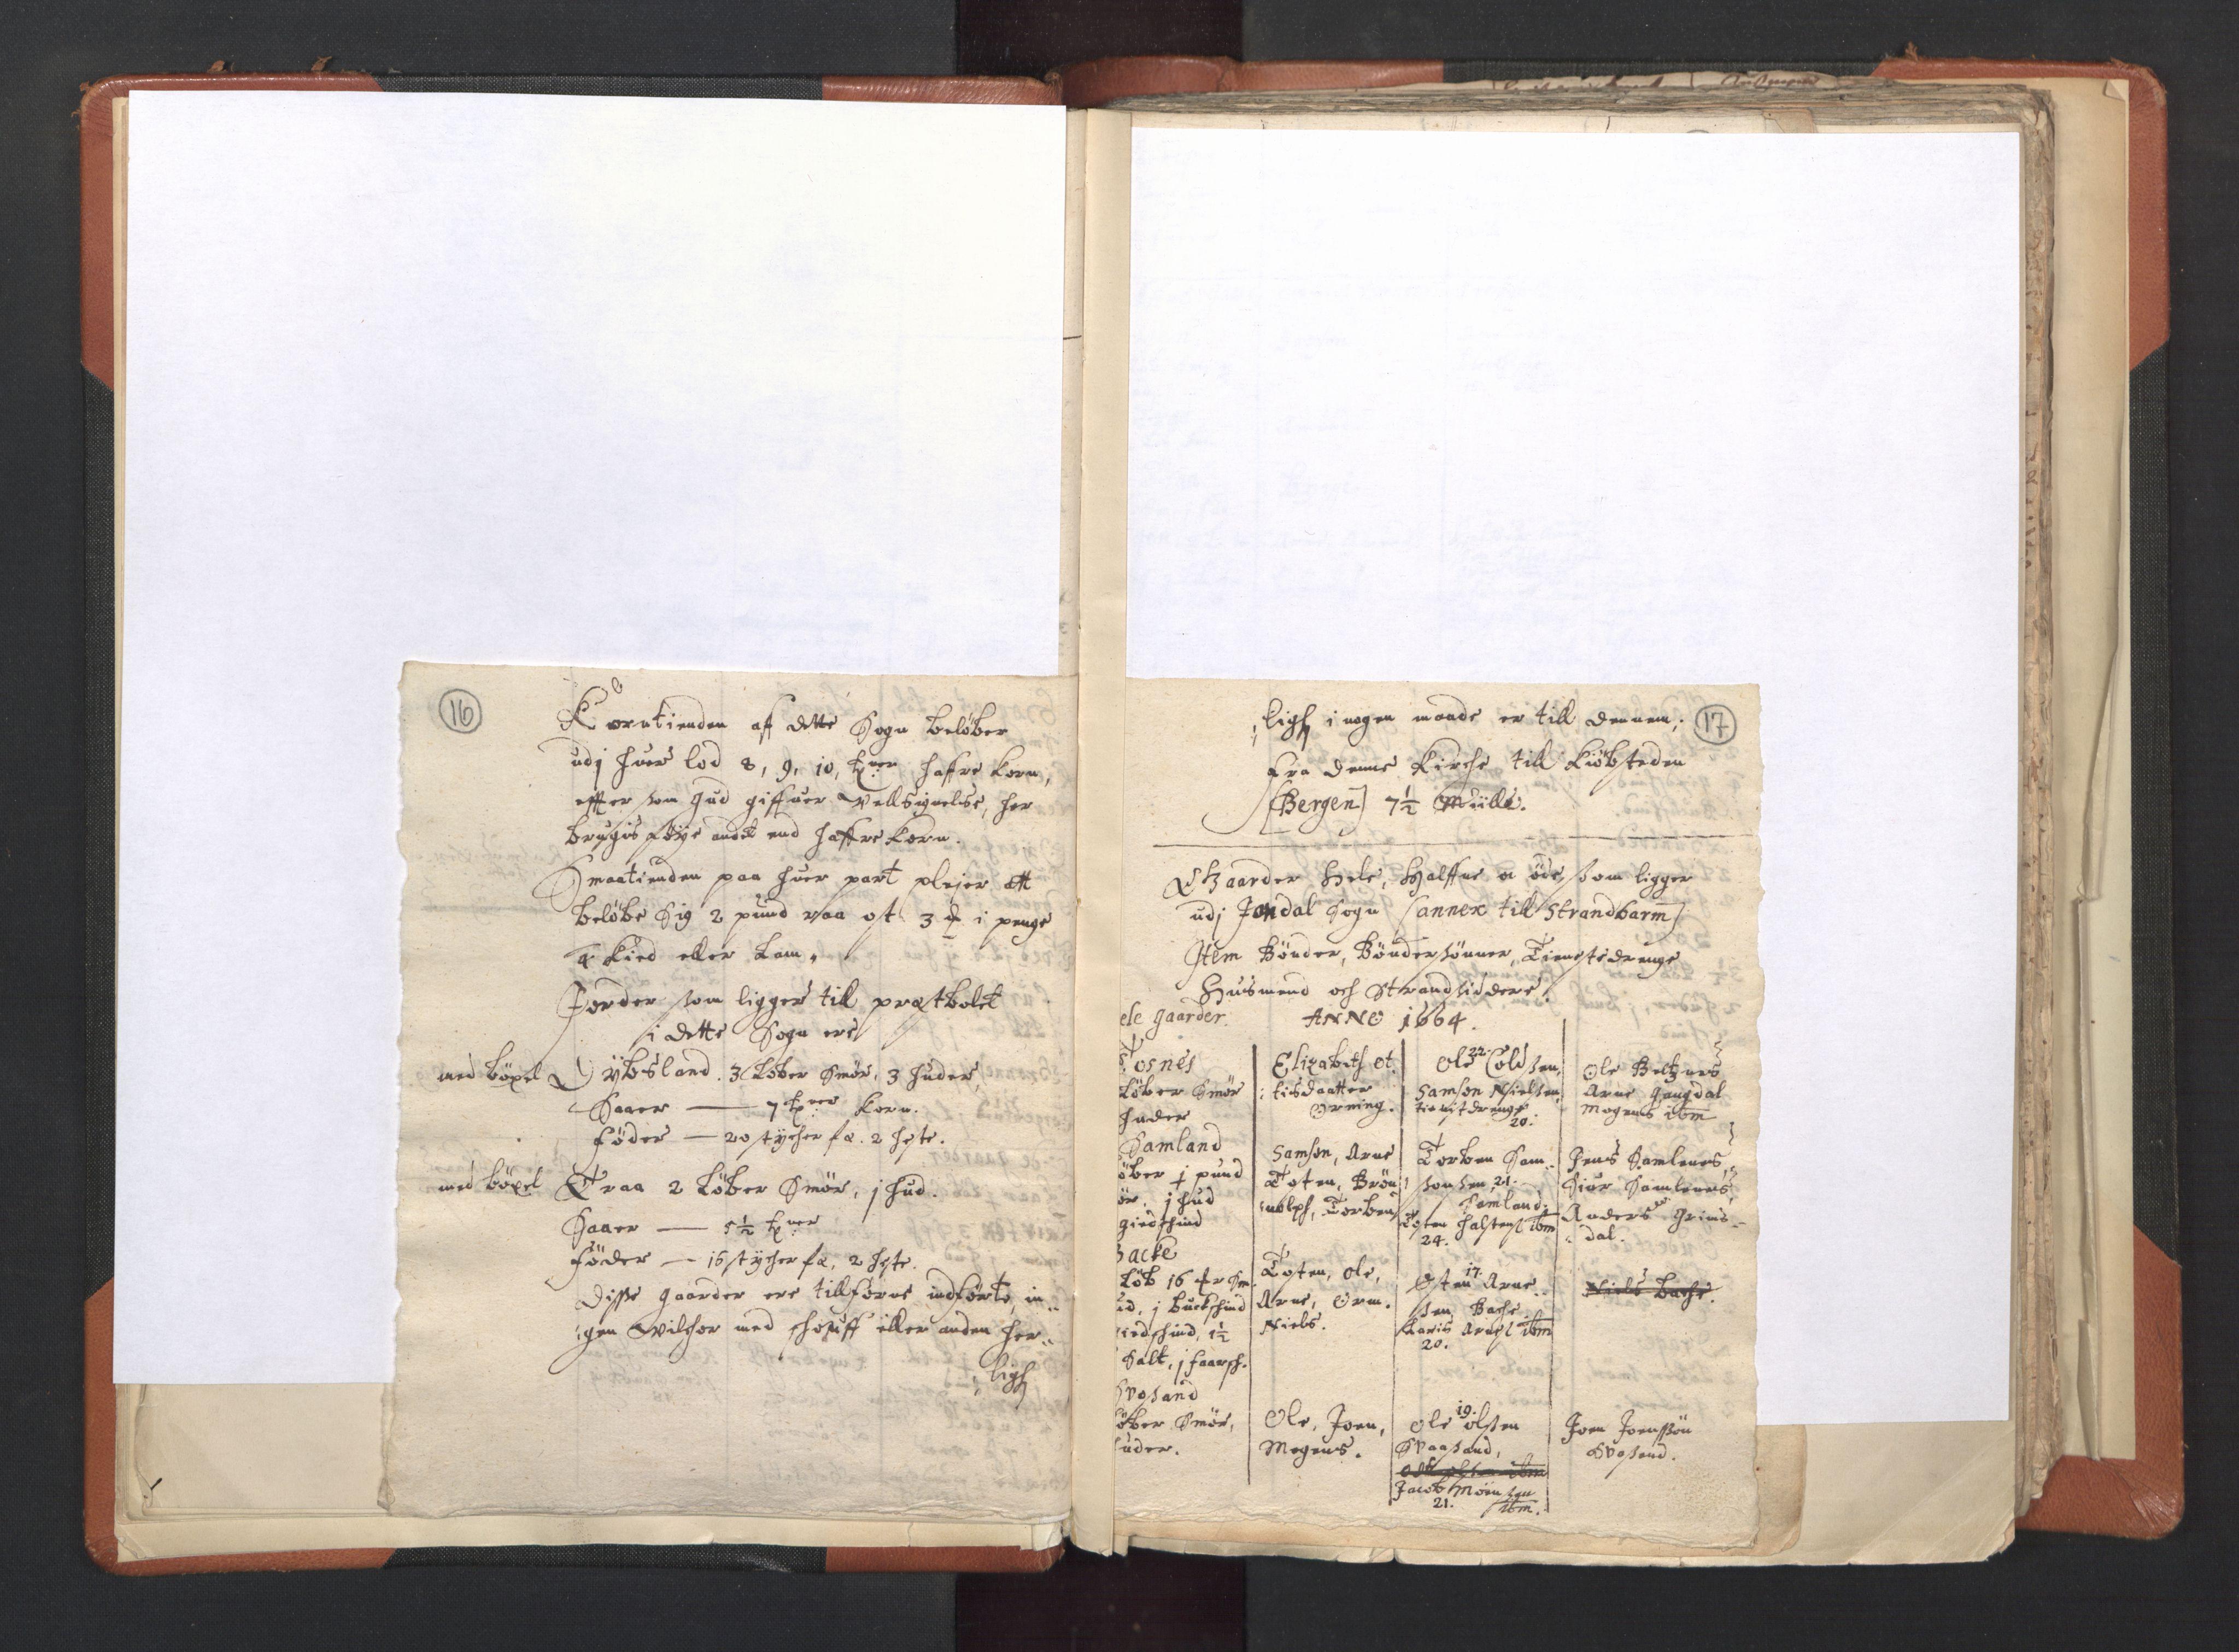 RA, Vicar's Census 1664-1666, no. 20: Sunnhordland deanery, 1664-1666, p. 16-17